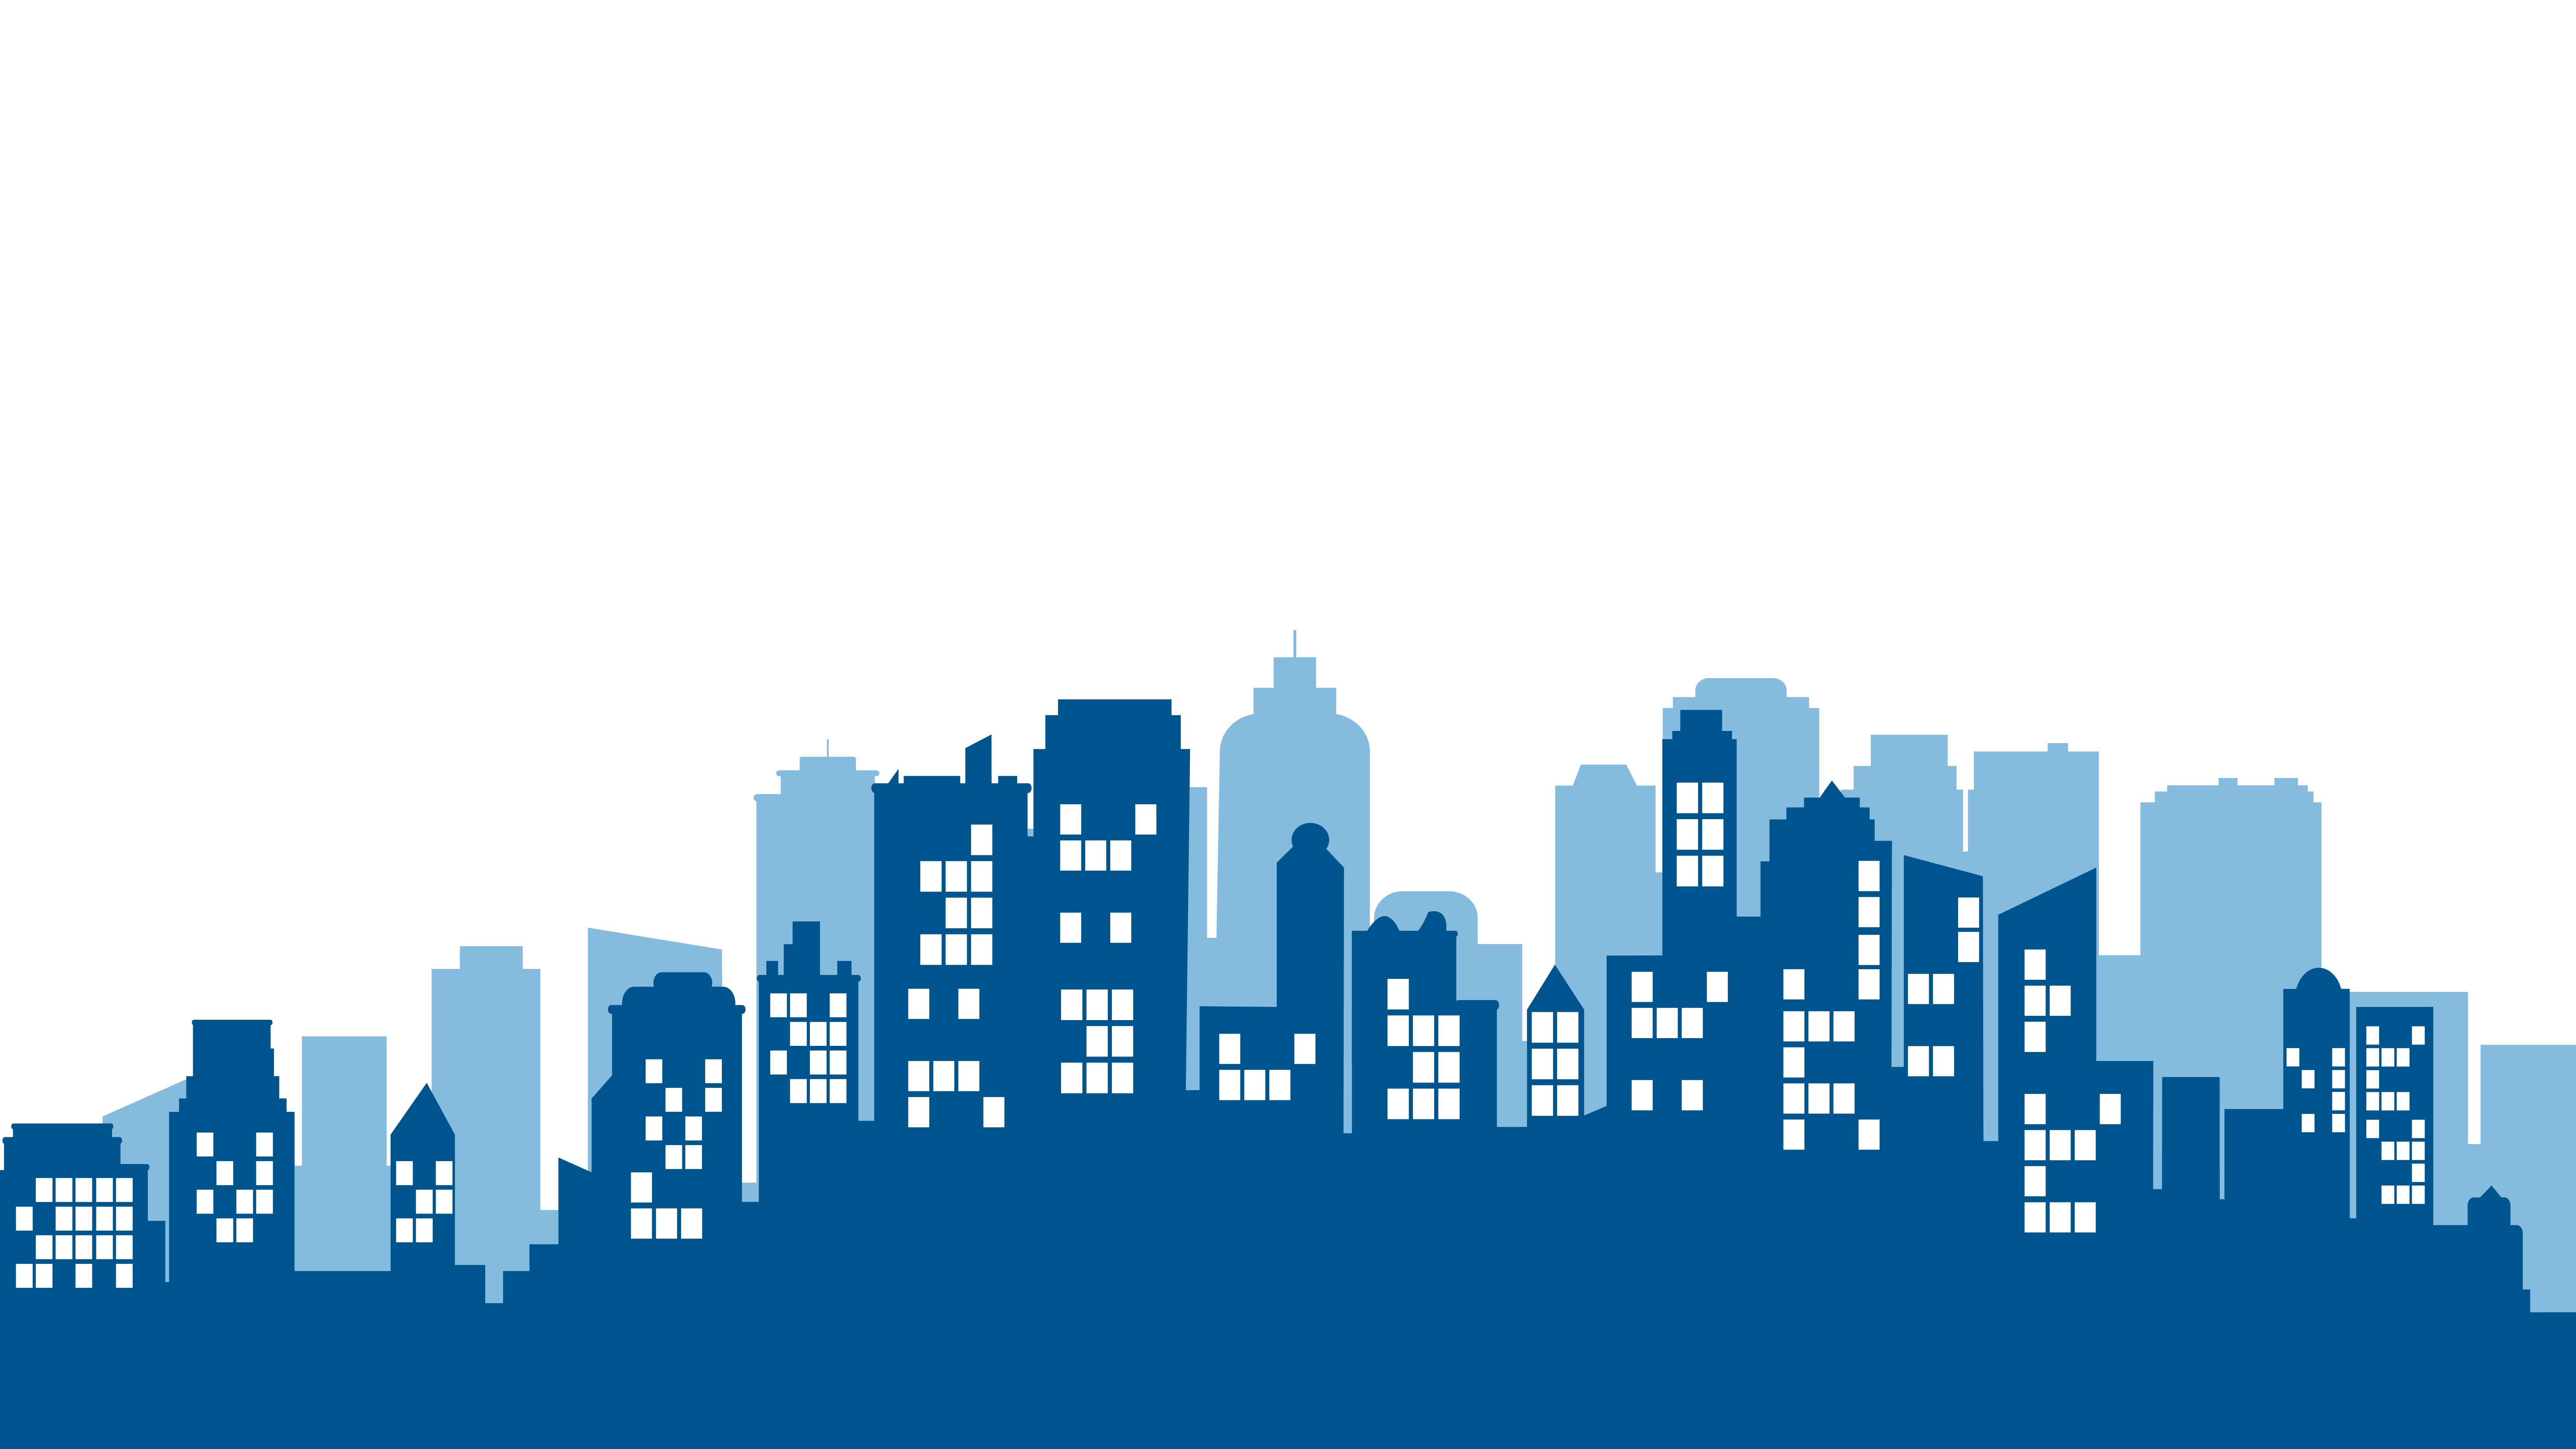 City landscape. Modern building architecture Urban cityscape. - Download Free Vectors, Clipart ...